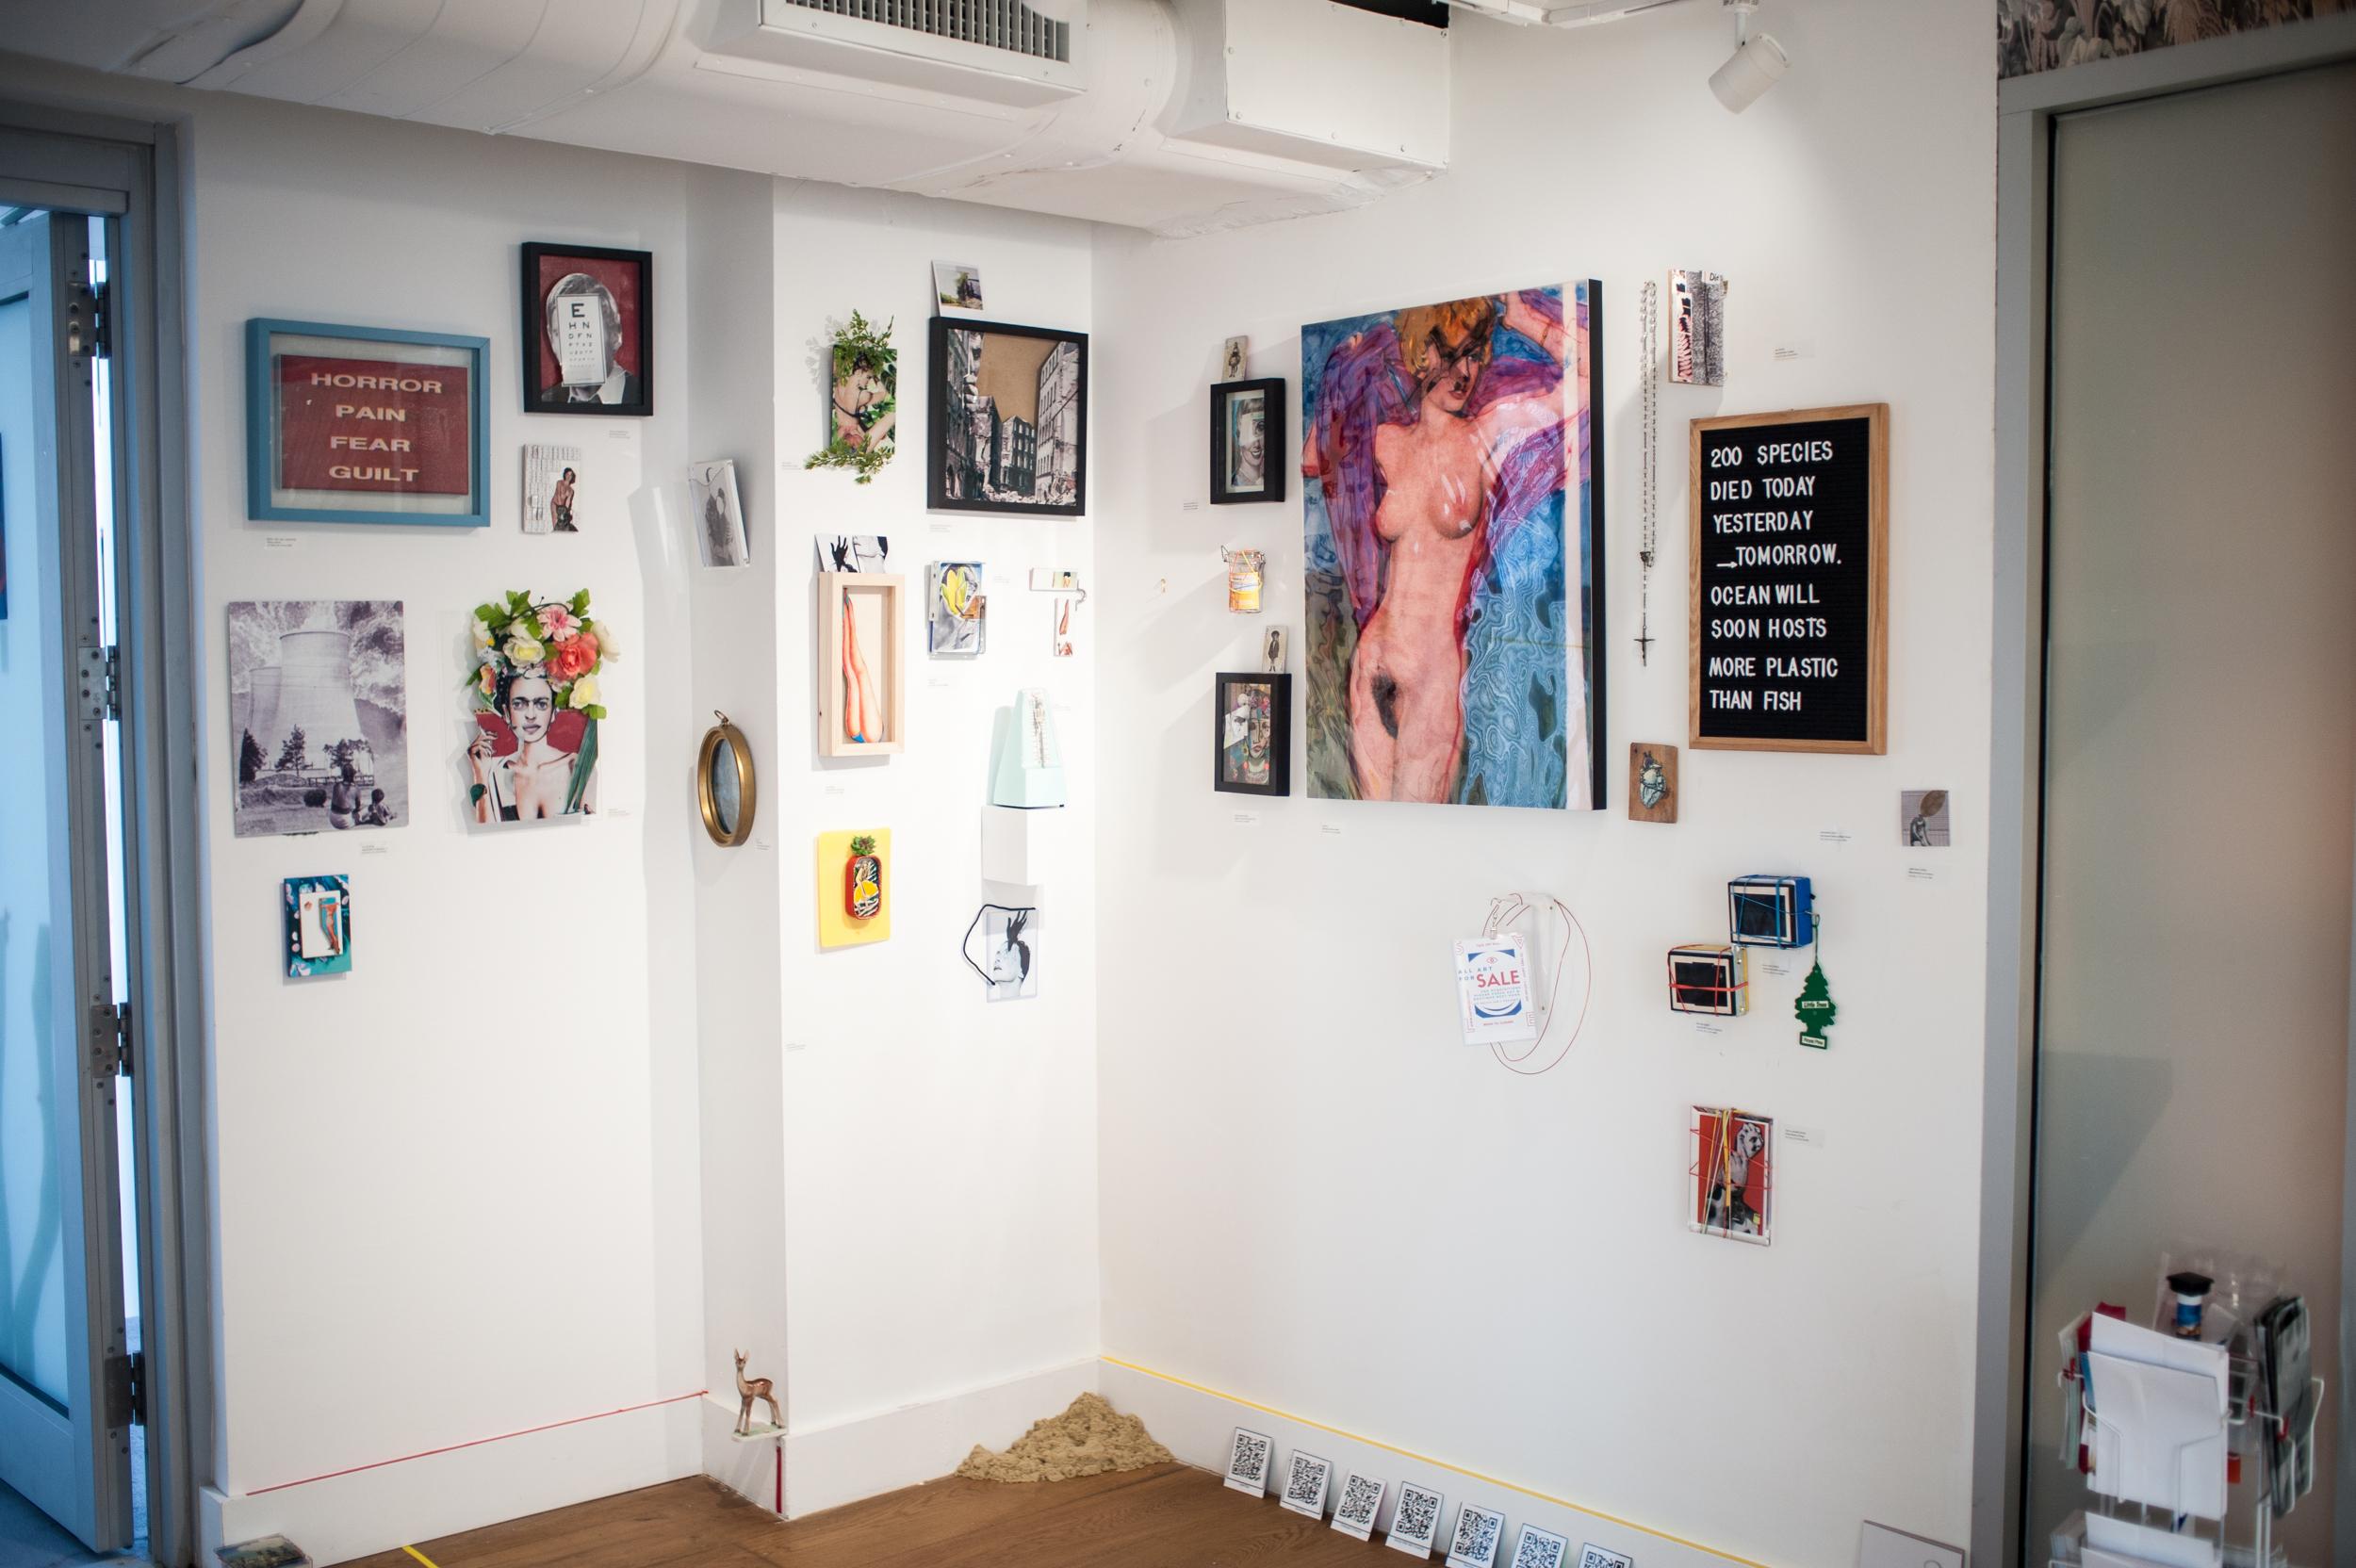 Faena-Exhibition-Images-14.jpg